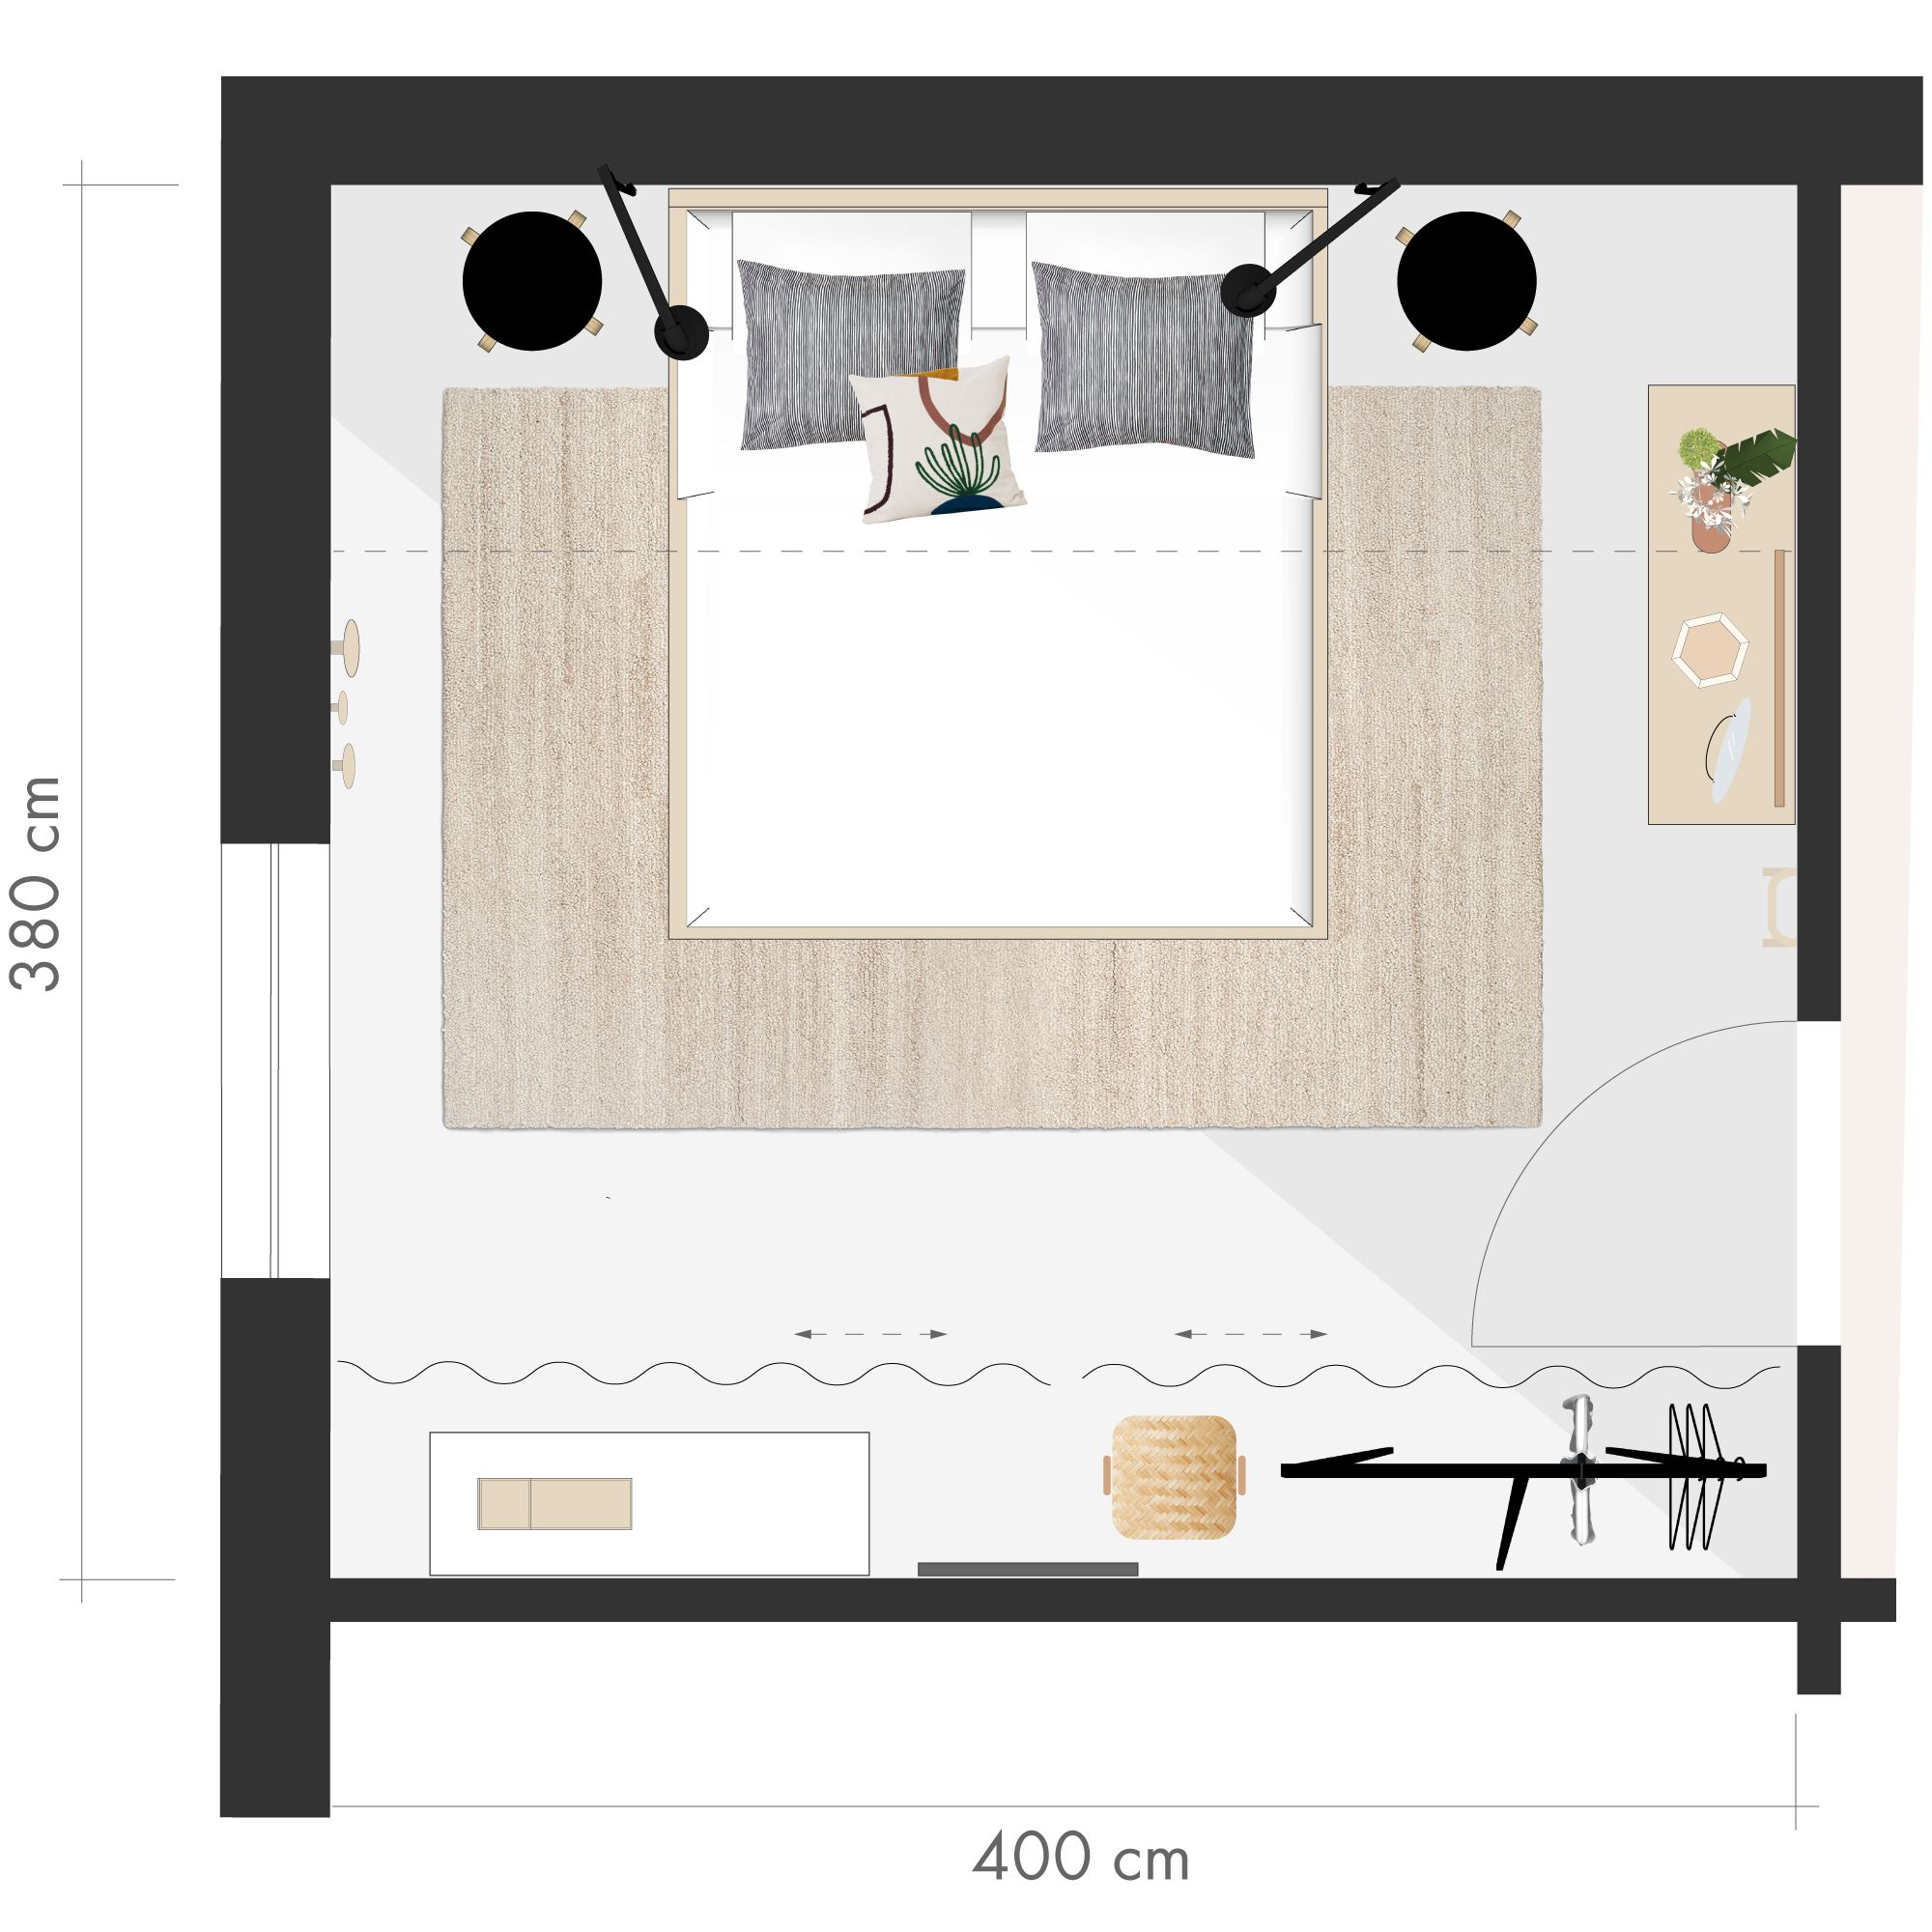 Schlafzimmer Gestalten In 2020 Schlafzimmer Gestalten